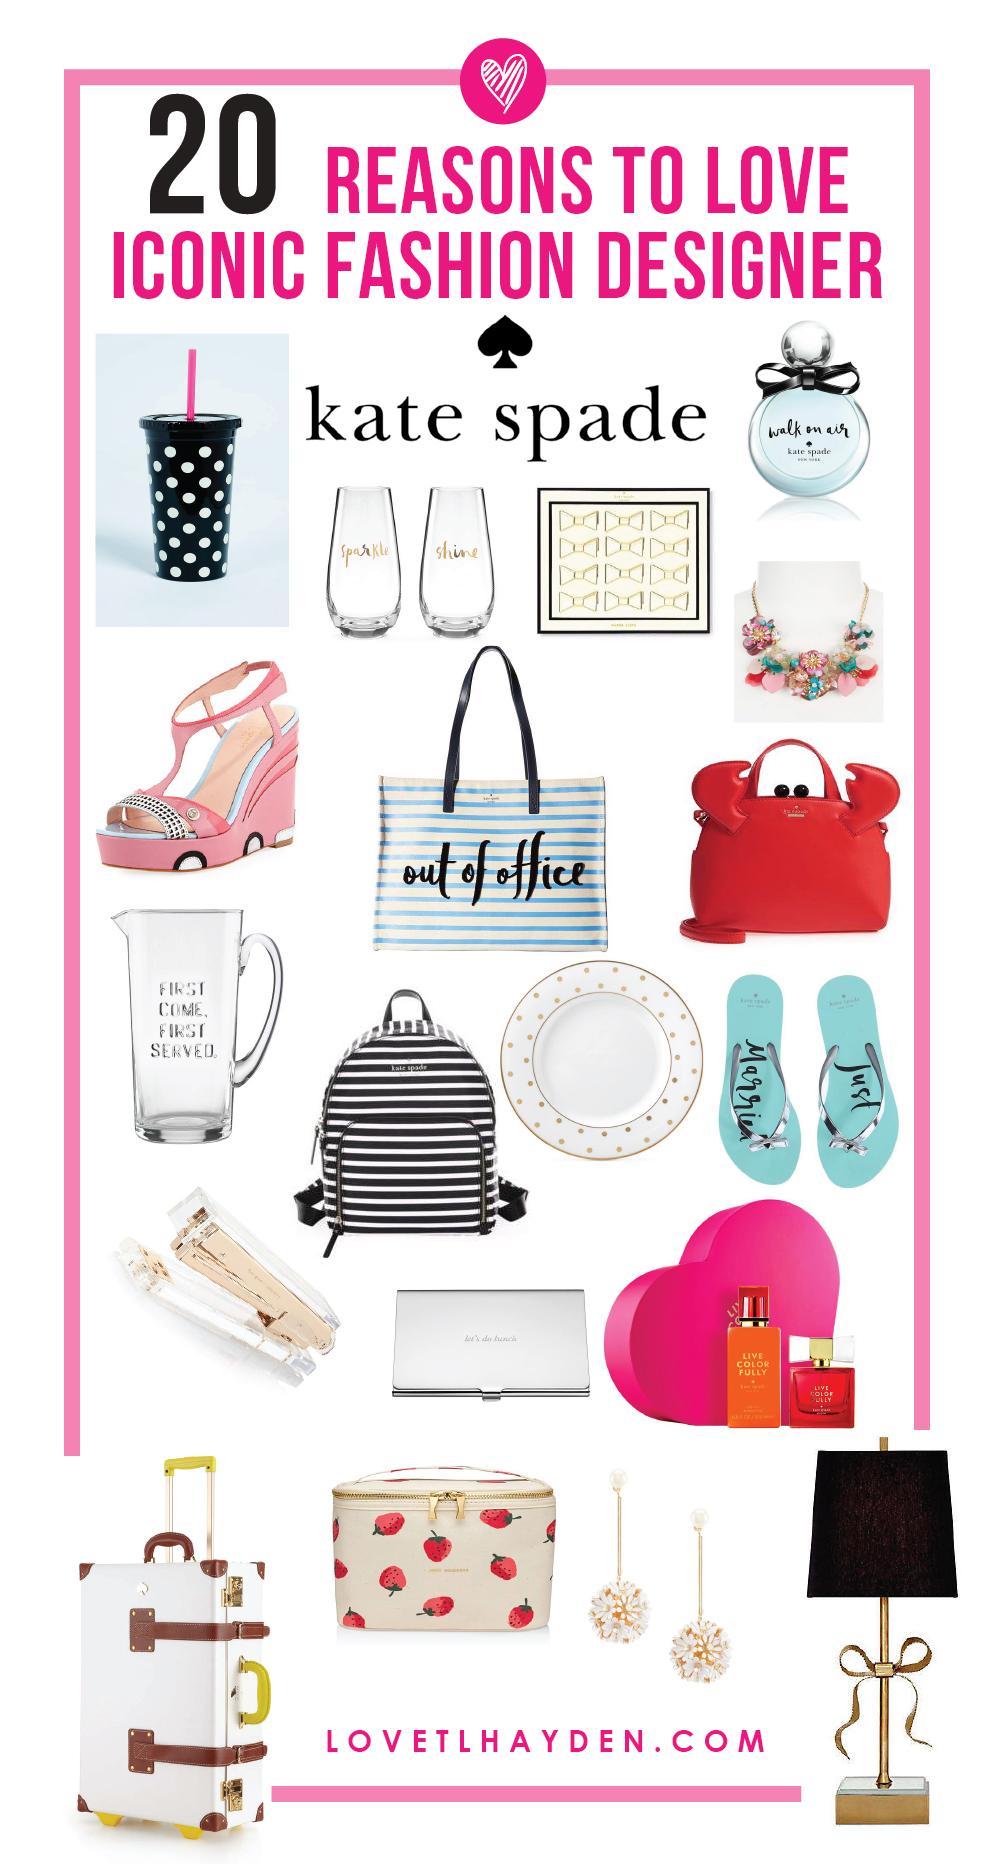 20 reasons to love iconic fashion designer kate spade